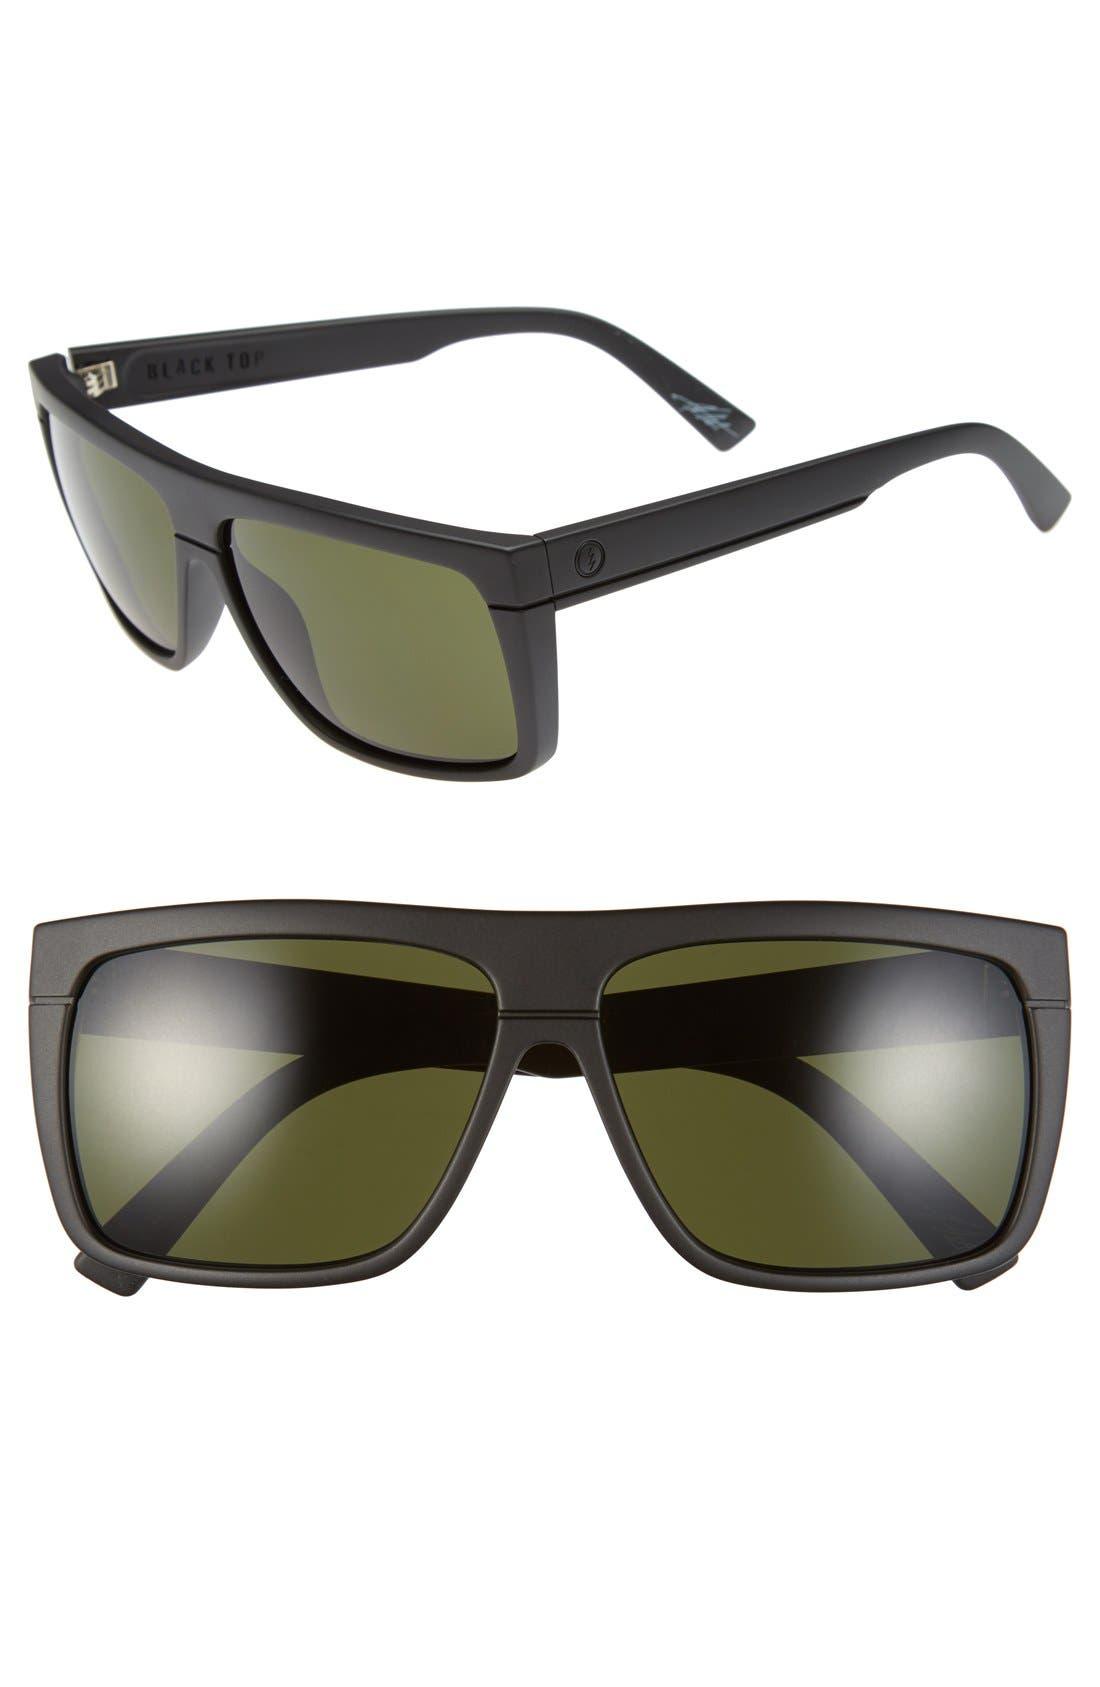 'Black Top' 61mm Flat Top Sunglasses,                             Main thumbnail 1, color,                             Matte Black/ Grey